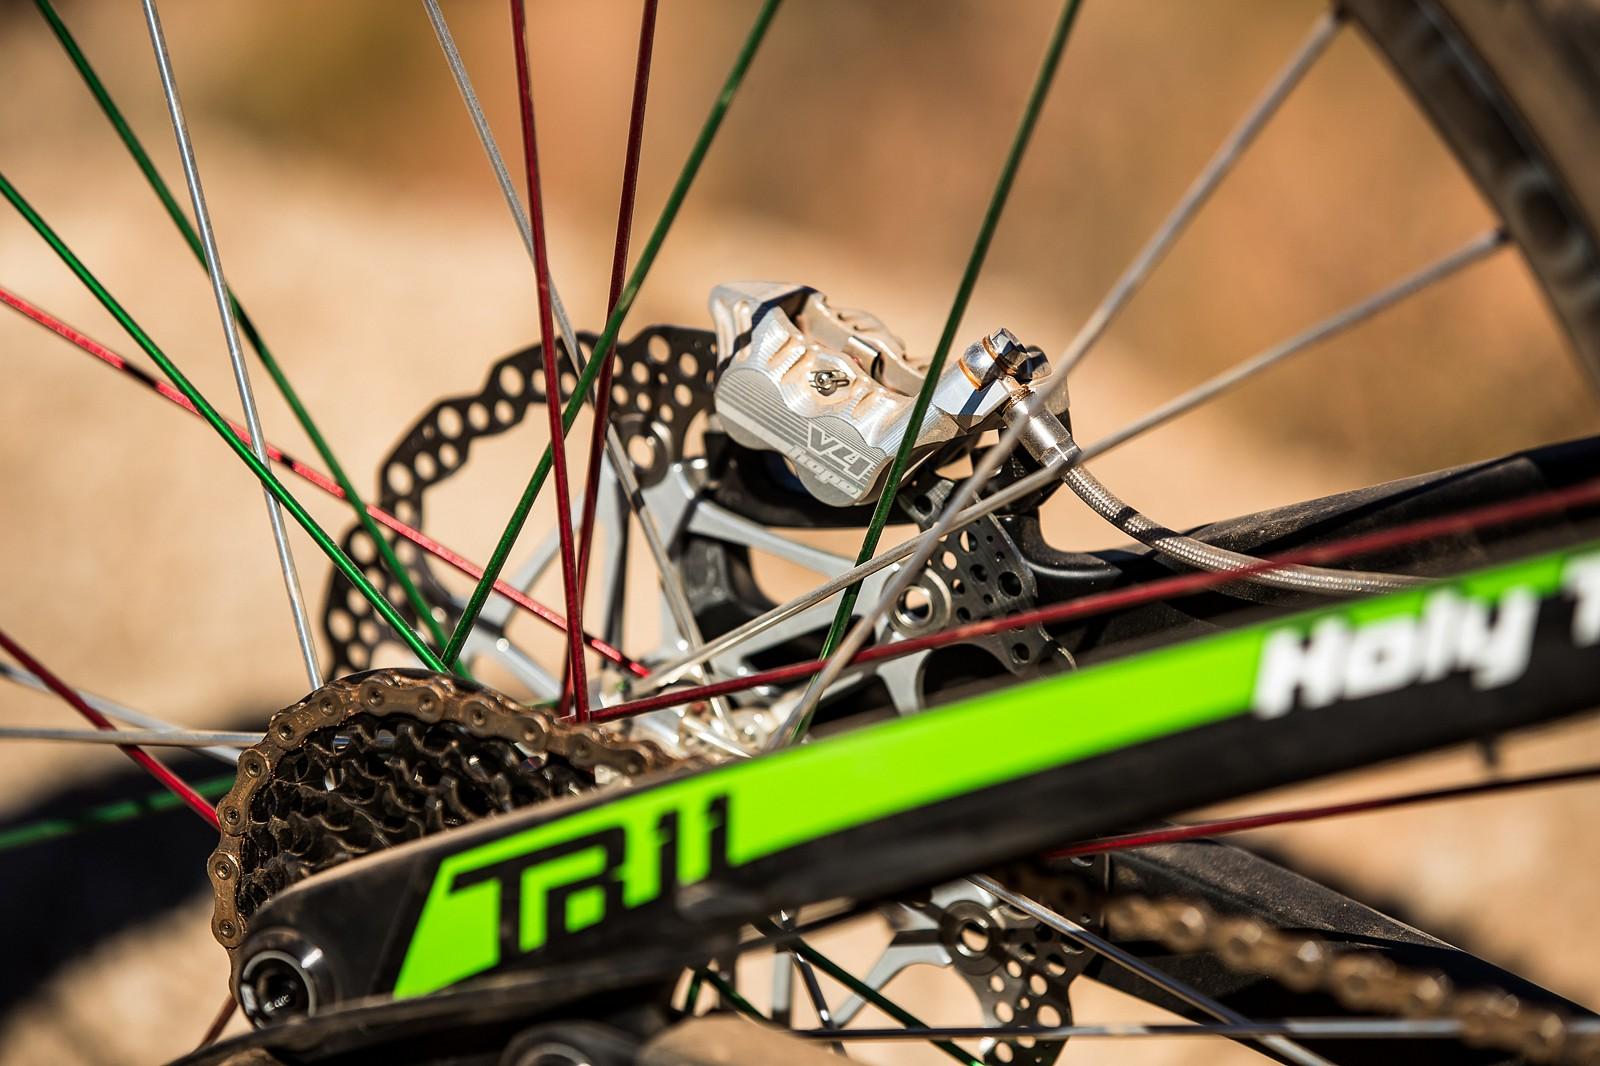 Hope Brakes on Juan Diego Salido's Transition TR11 at Rampage 2019 - RAMPAGE BIKE - Juan Diego Salido's Transition TR11 - Mountain Biking Pictures - Vital MTB